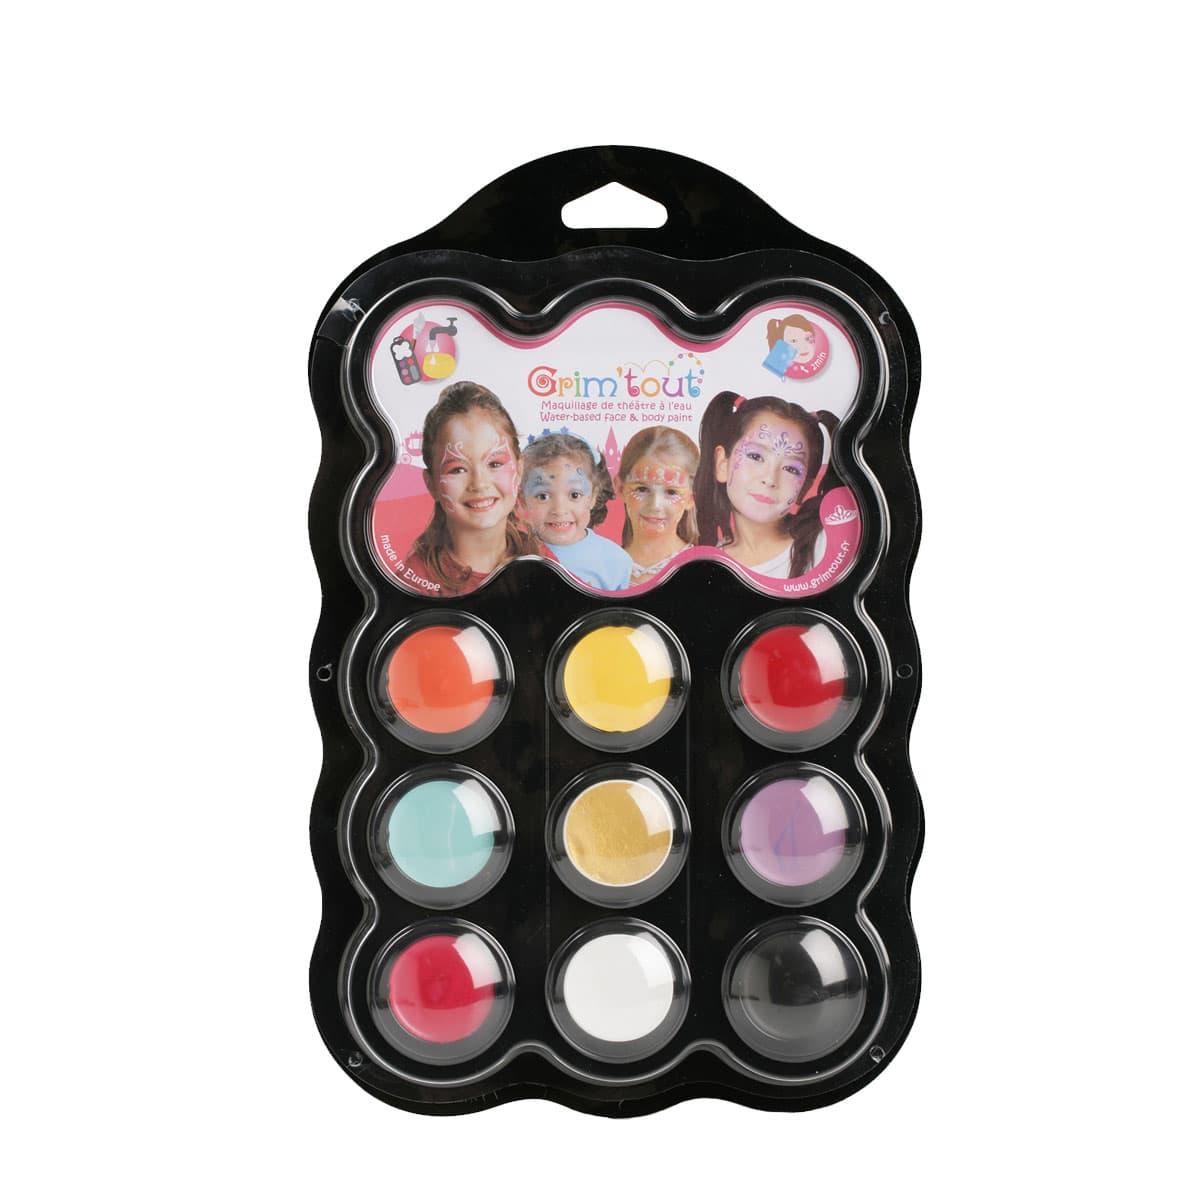 paleta-maquillaje-princesa-grimtout